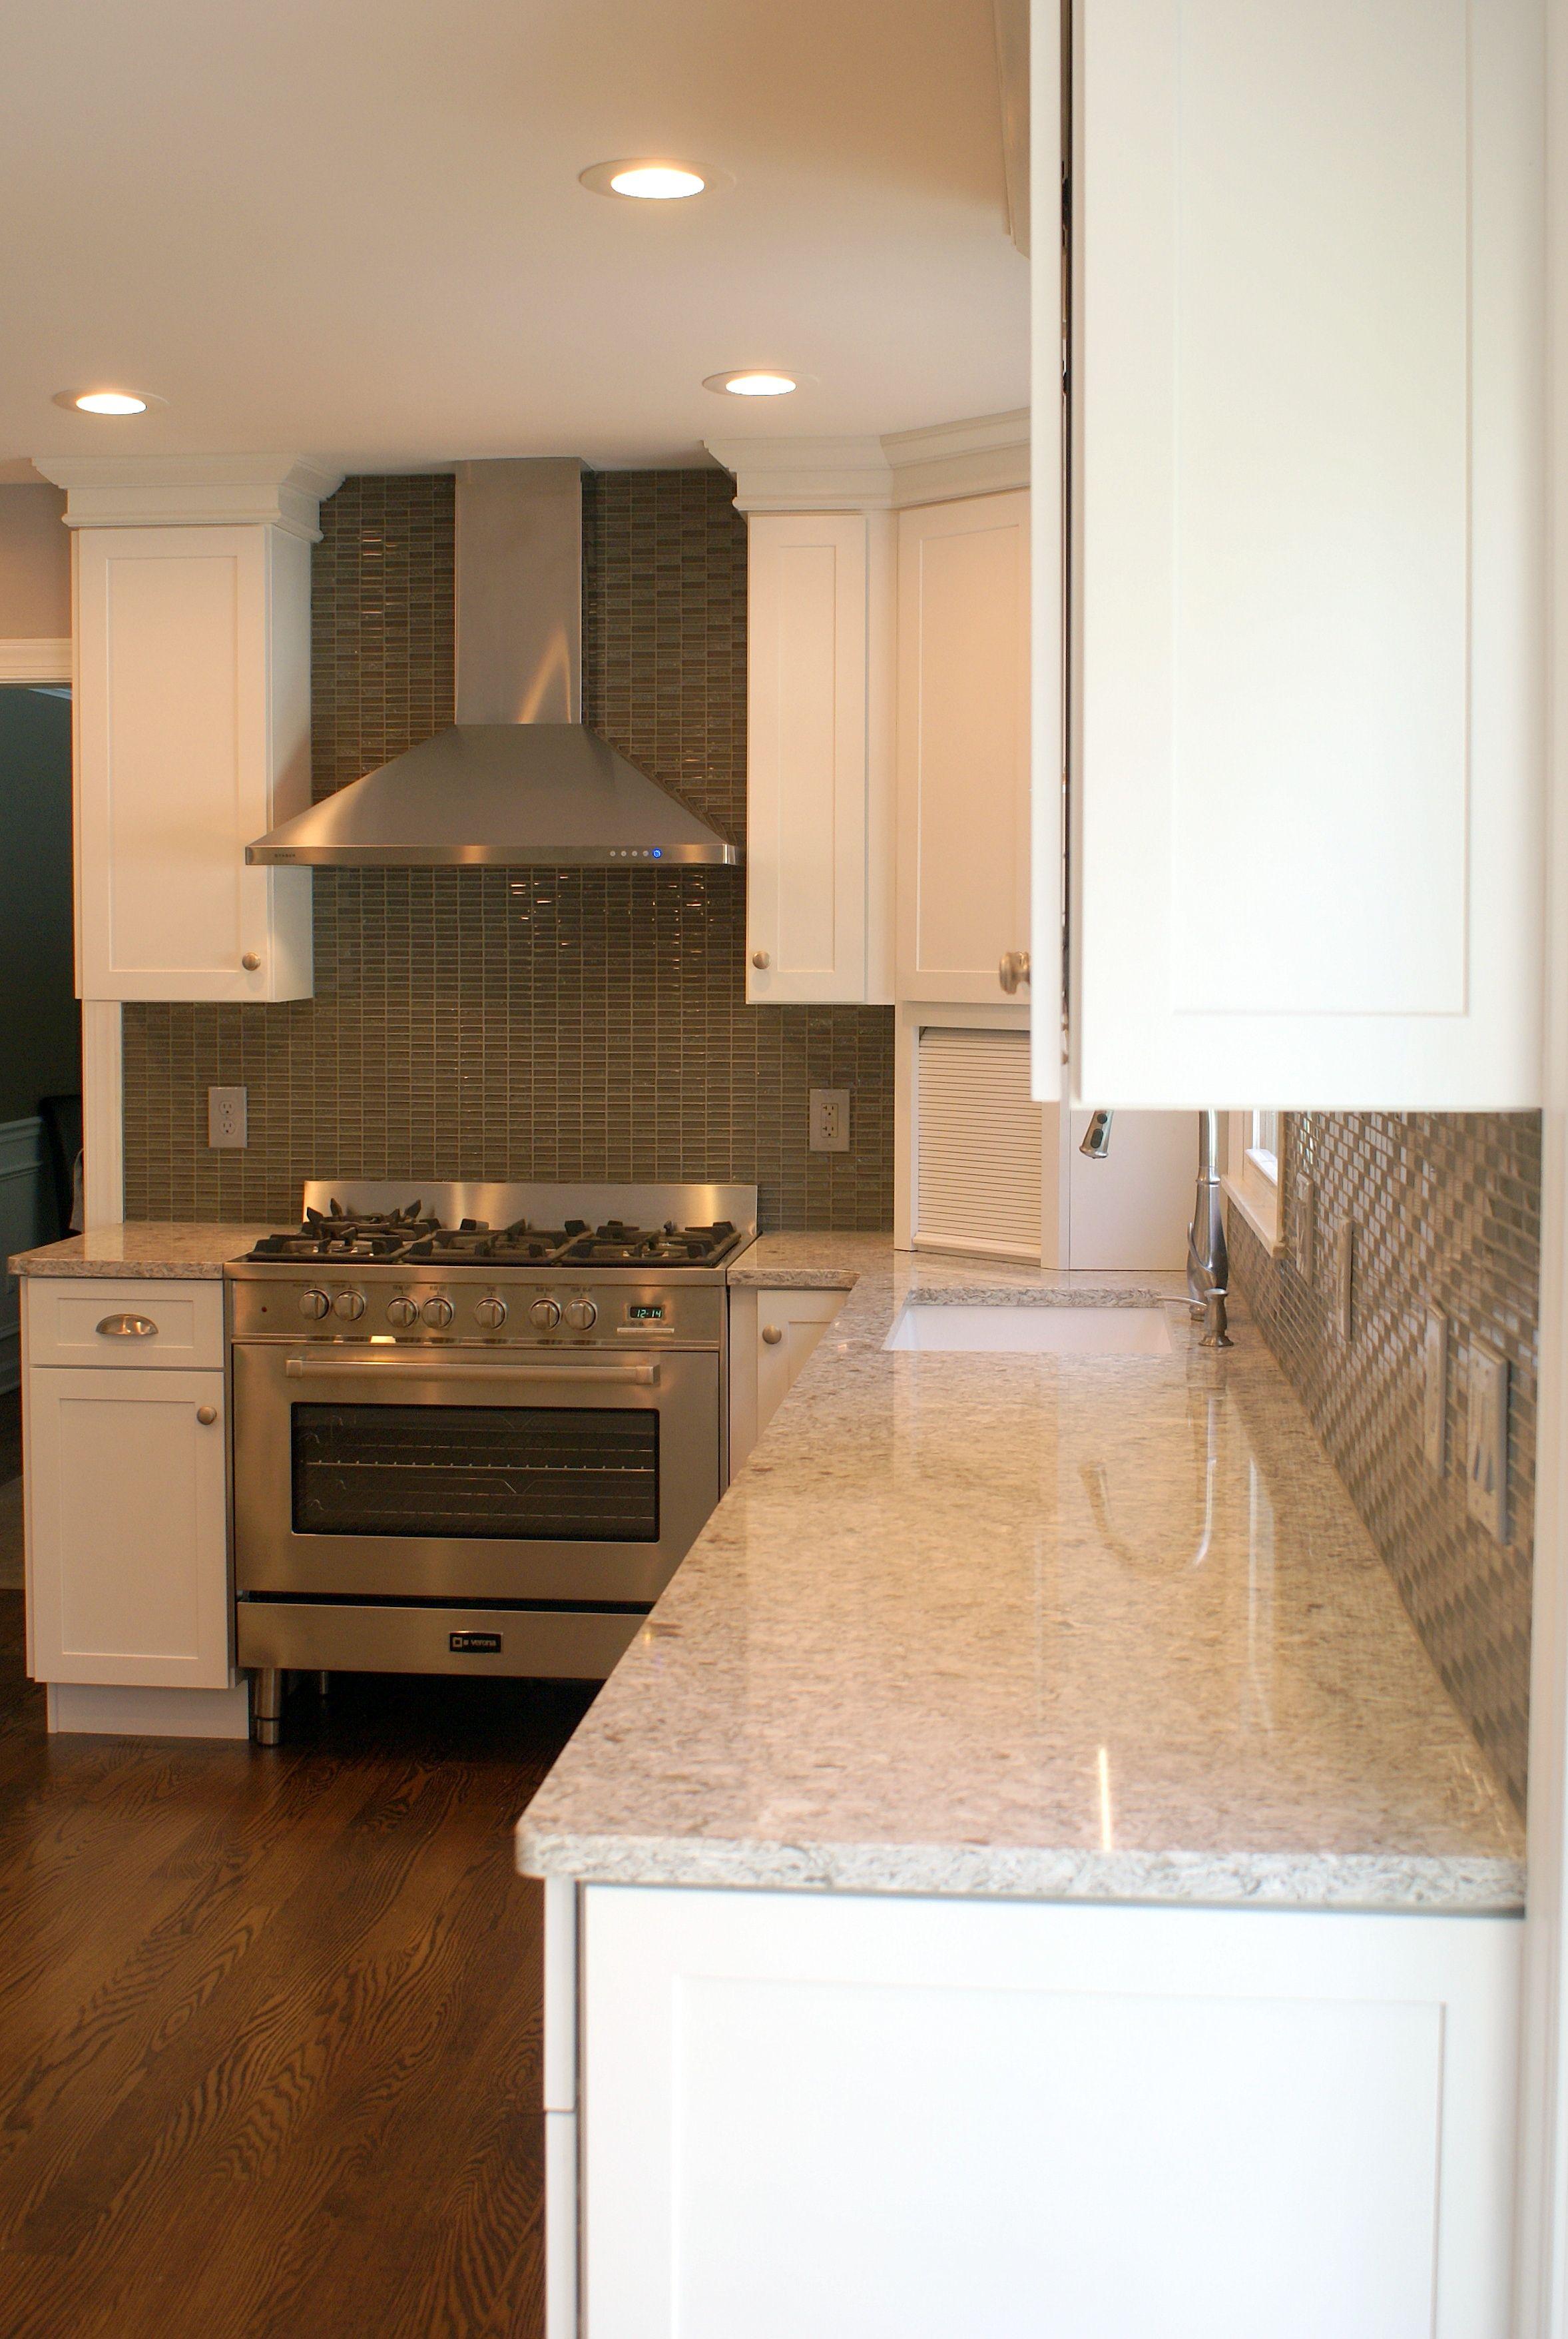 White Diamond kitchen with new quay quartz countertops (4